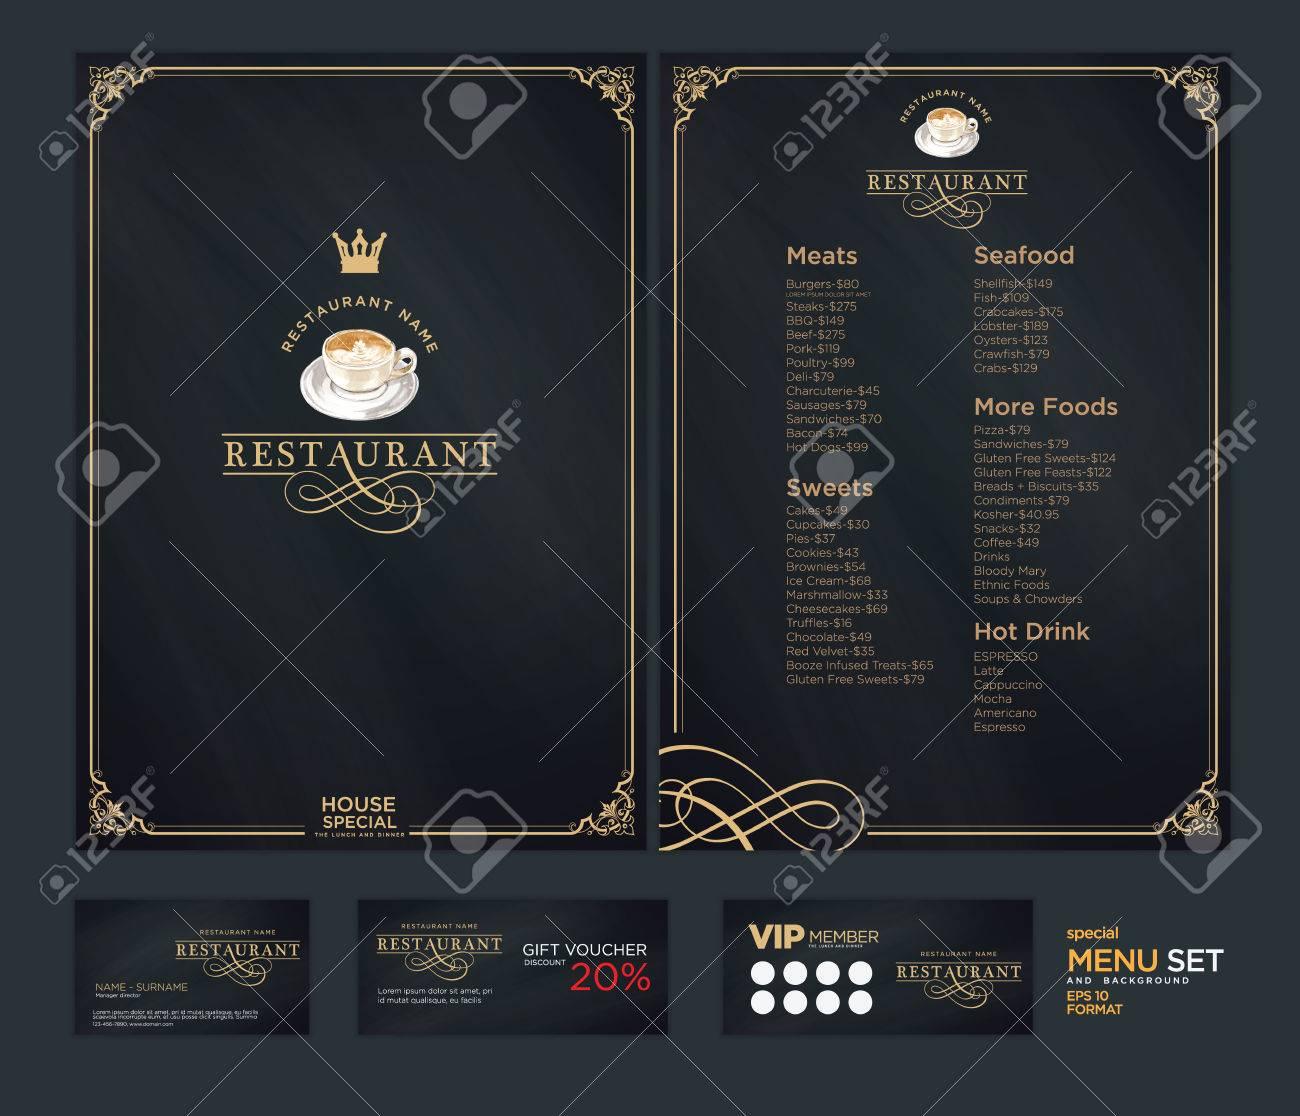 Creative Menu Design Layout Design Design Set For Menu Restaurant Royalty Free Cliparts Vectors And Stock Illustration Image 71498965